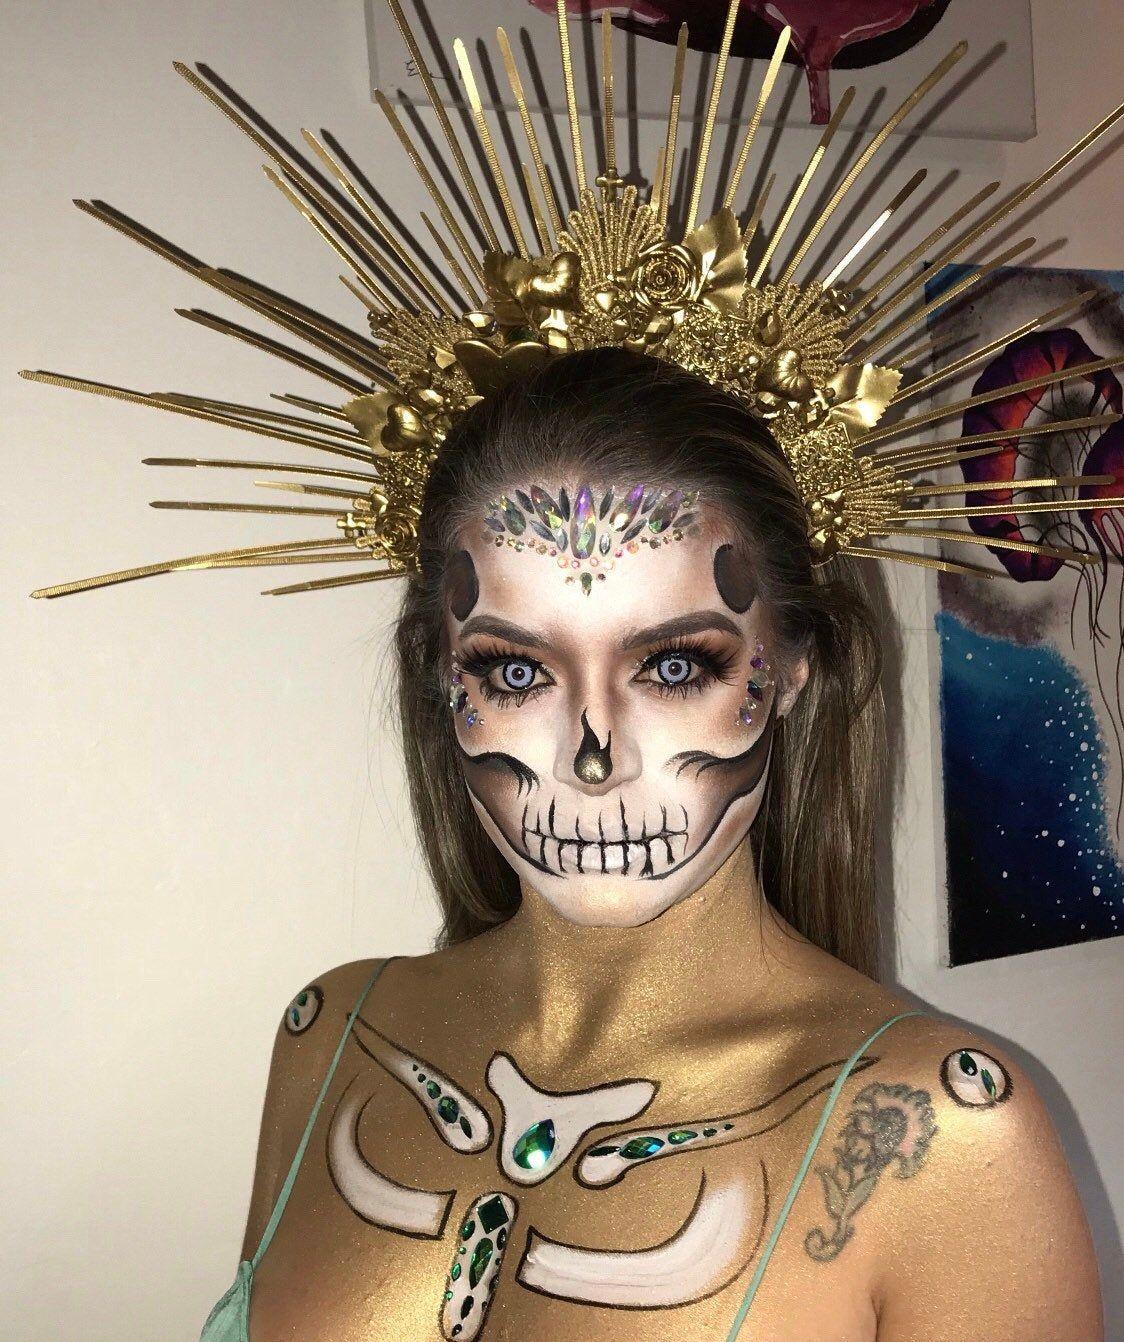 Ou Acheter Maquillage Halloween.Halo Crown Sunburst Crown Embellished Customizable Halloween Makeup Inspiration